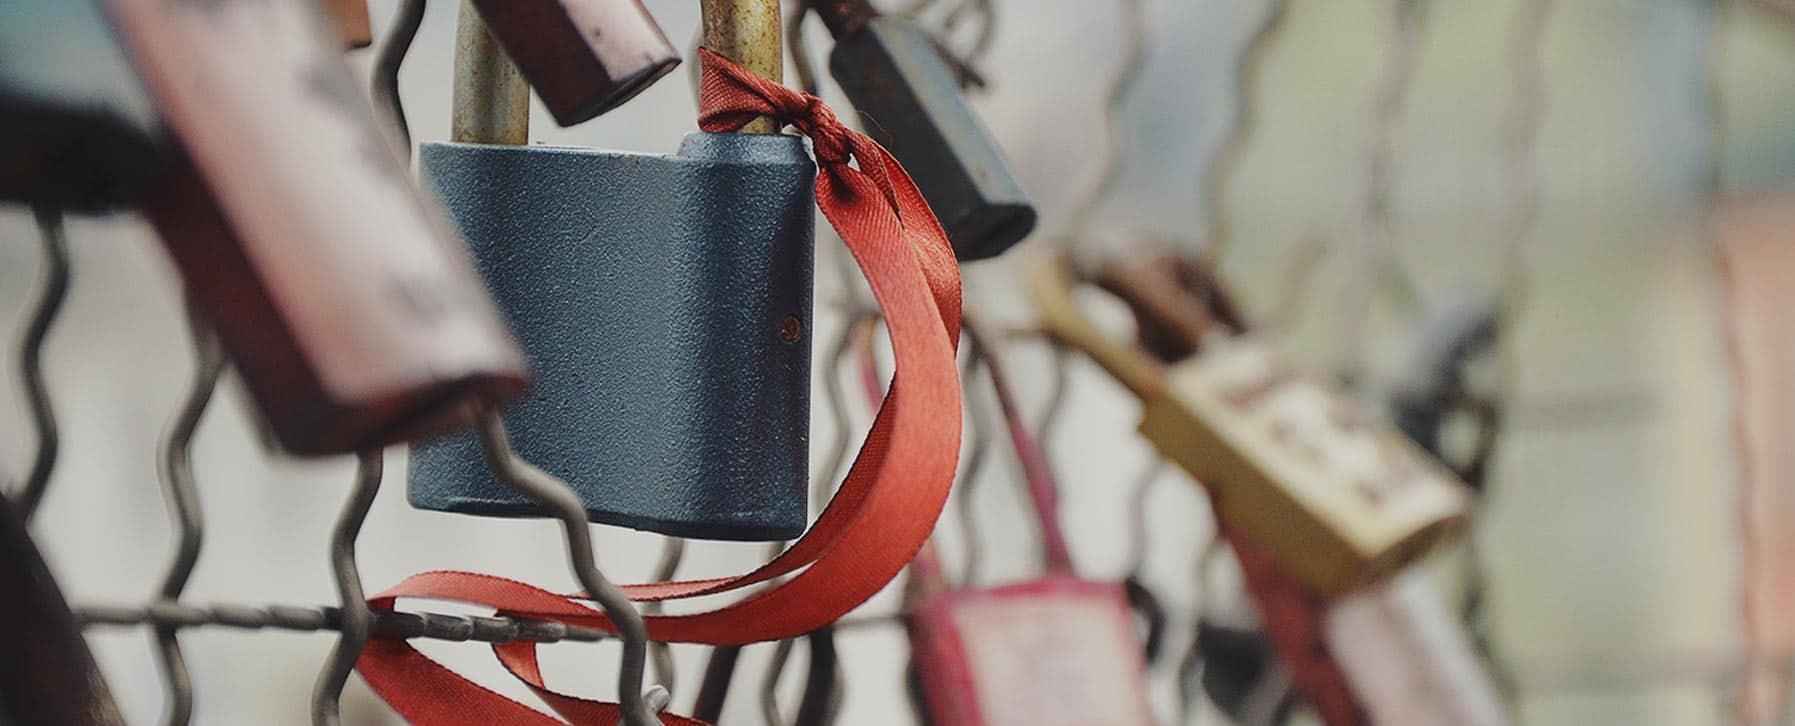 Killing Keywords Softly With Encryption